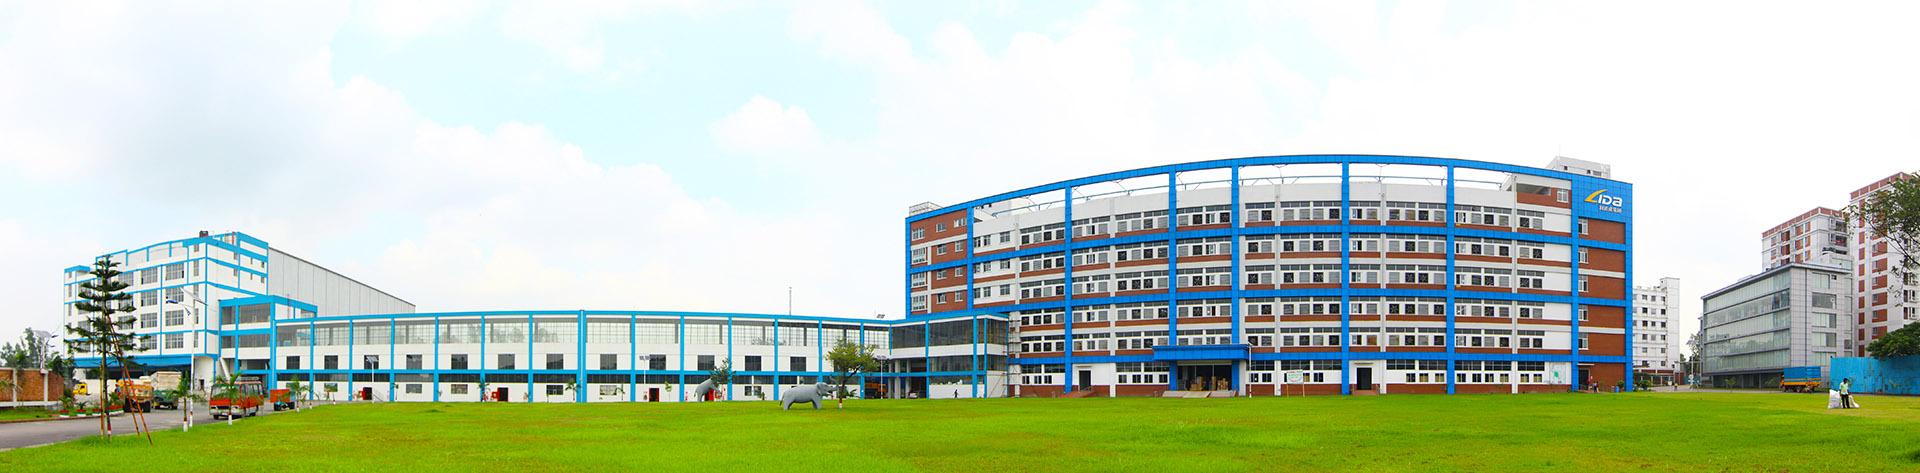 Lida Panorama